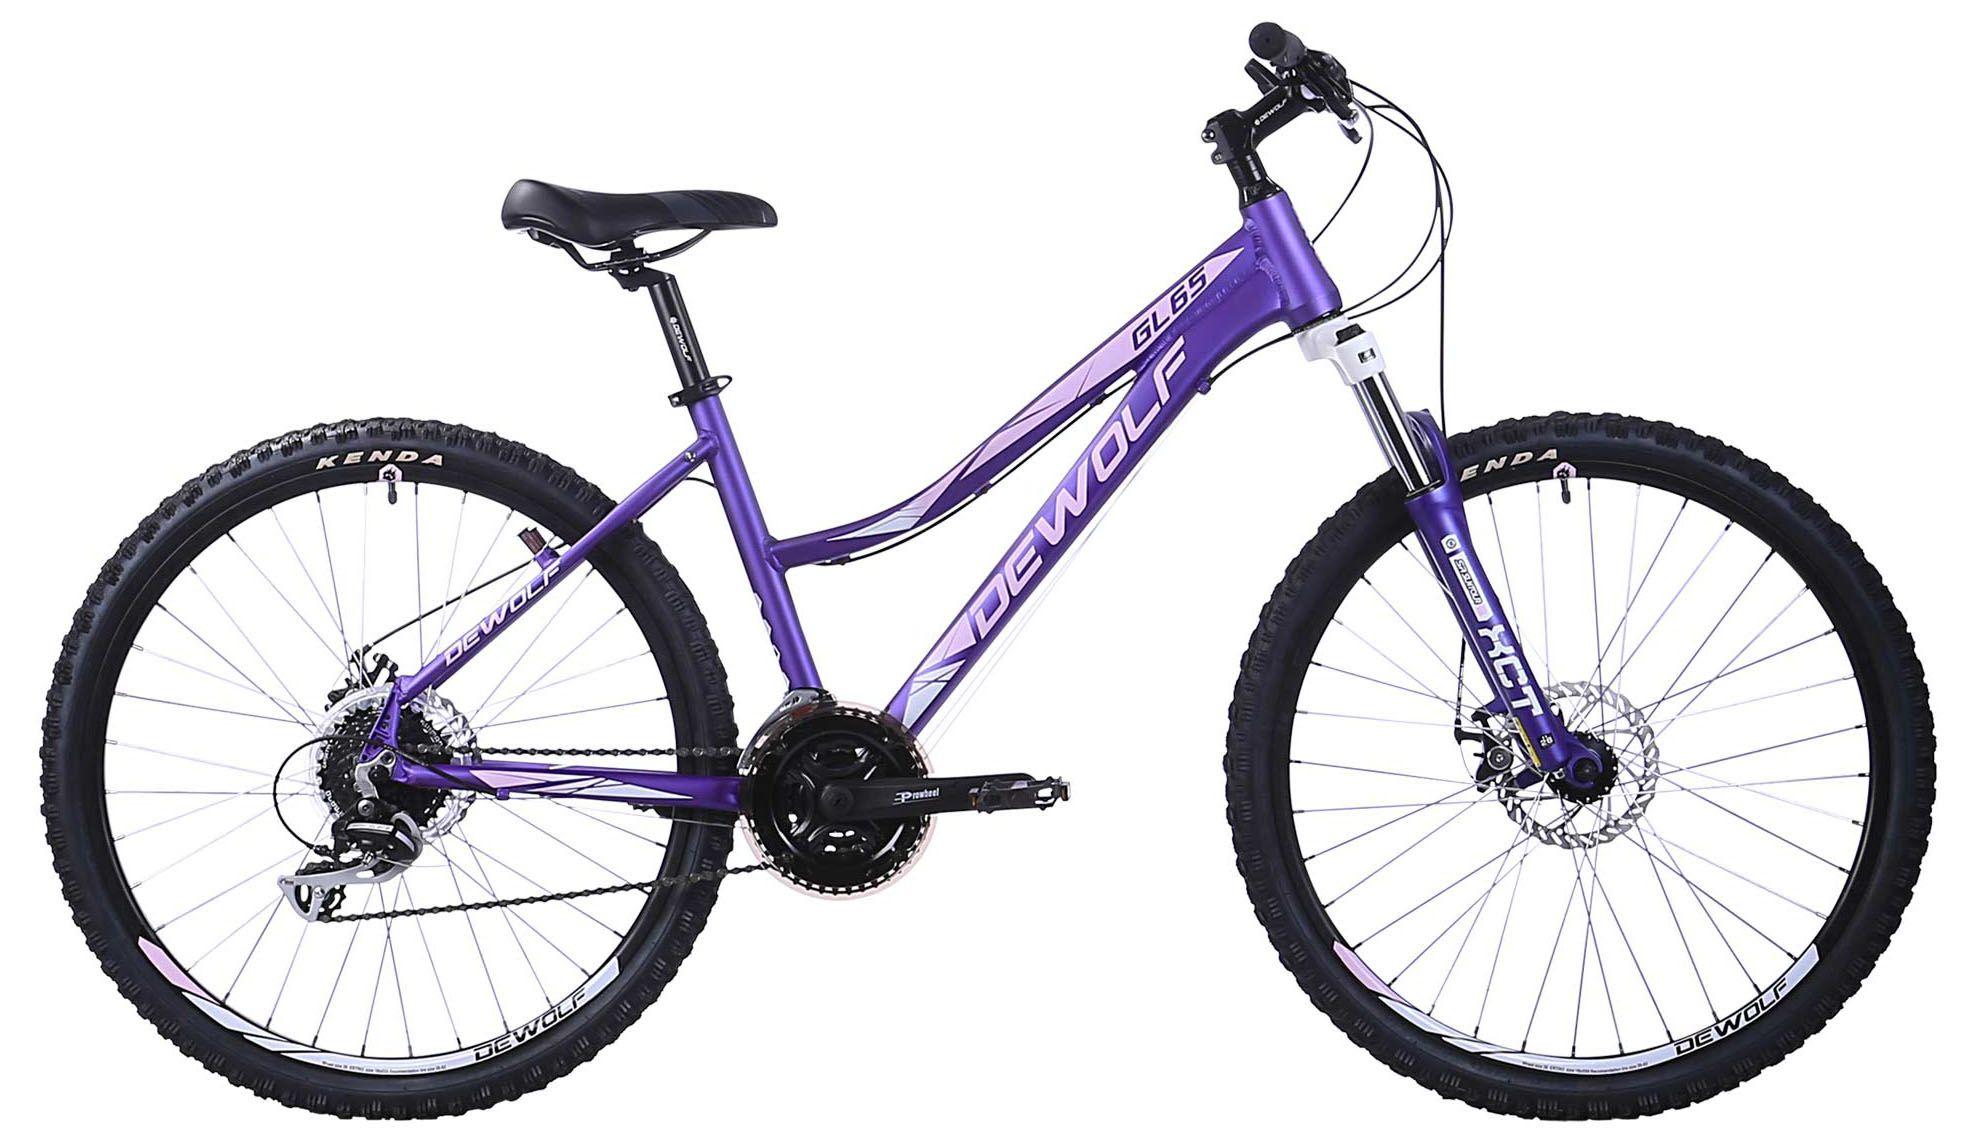 Велосипед Dewolf GL 65 2018 велосипед dewolf wave 210 2018